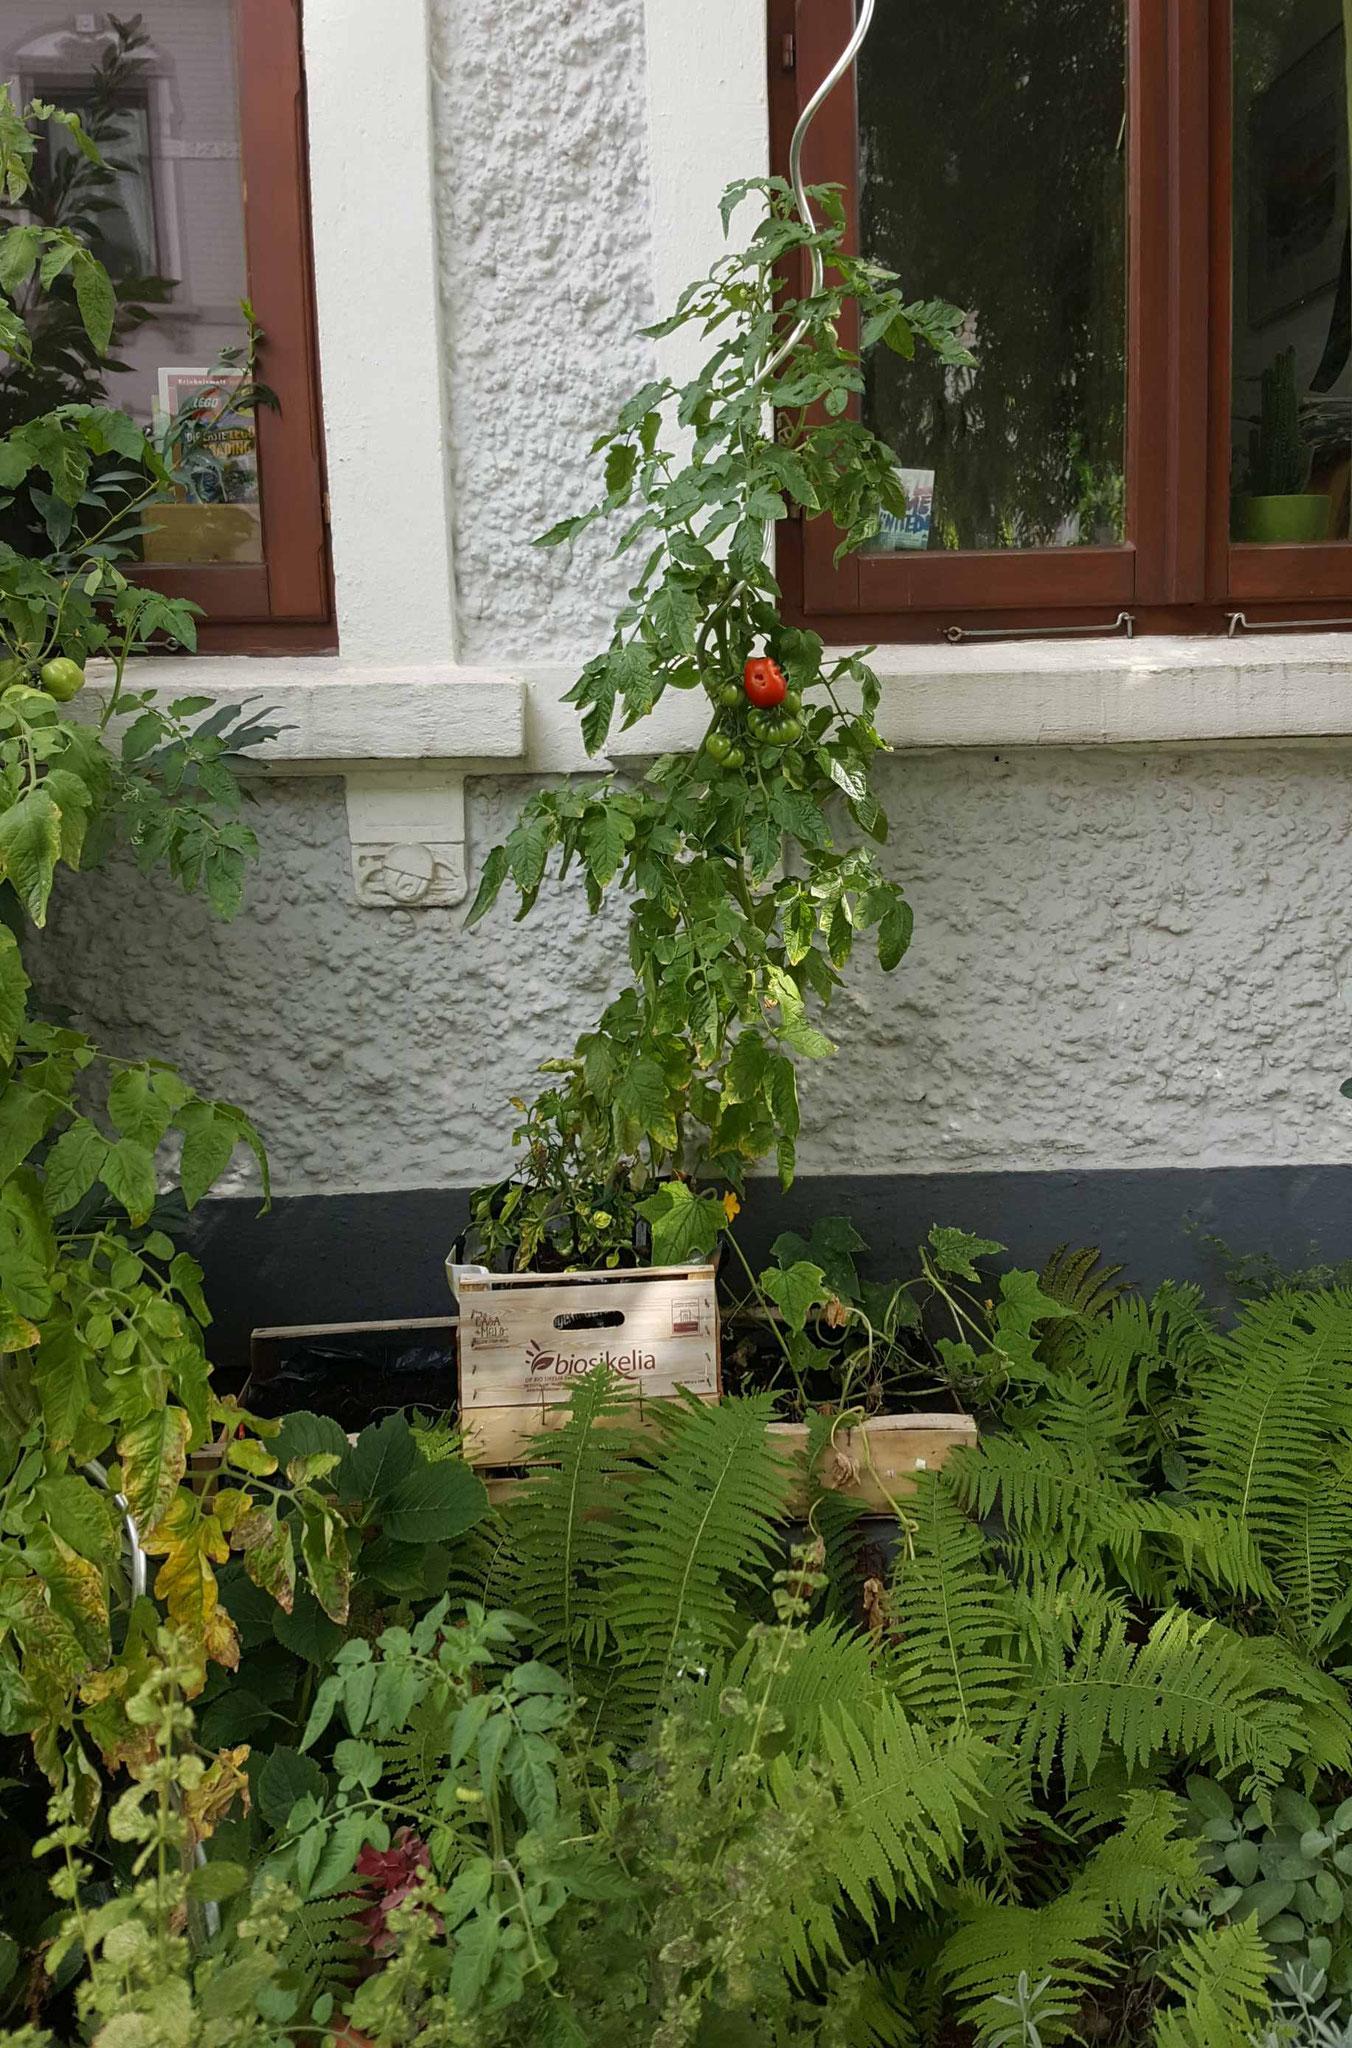 2. Preis:  Vorgarten Geibelstrasse 61 / Familie Petersen